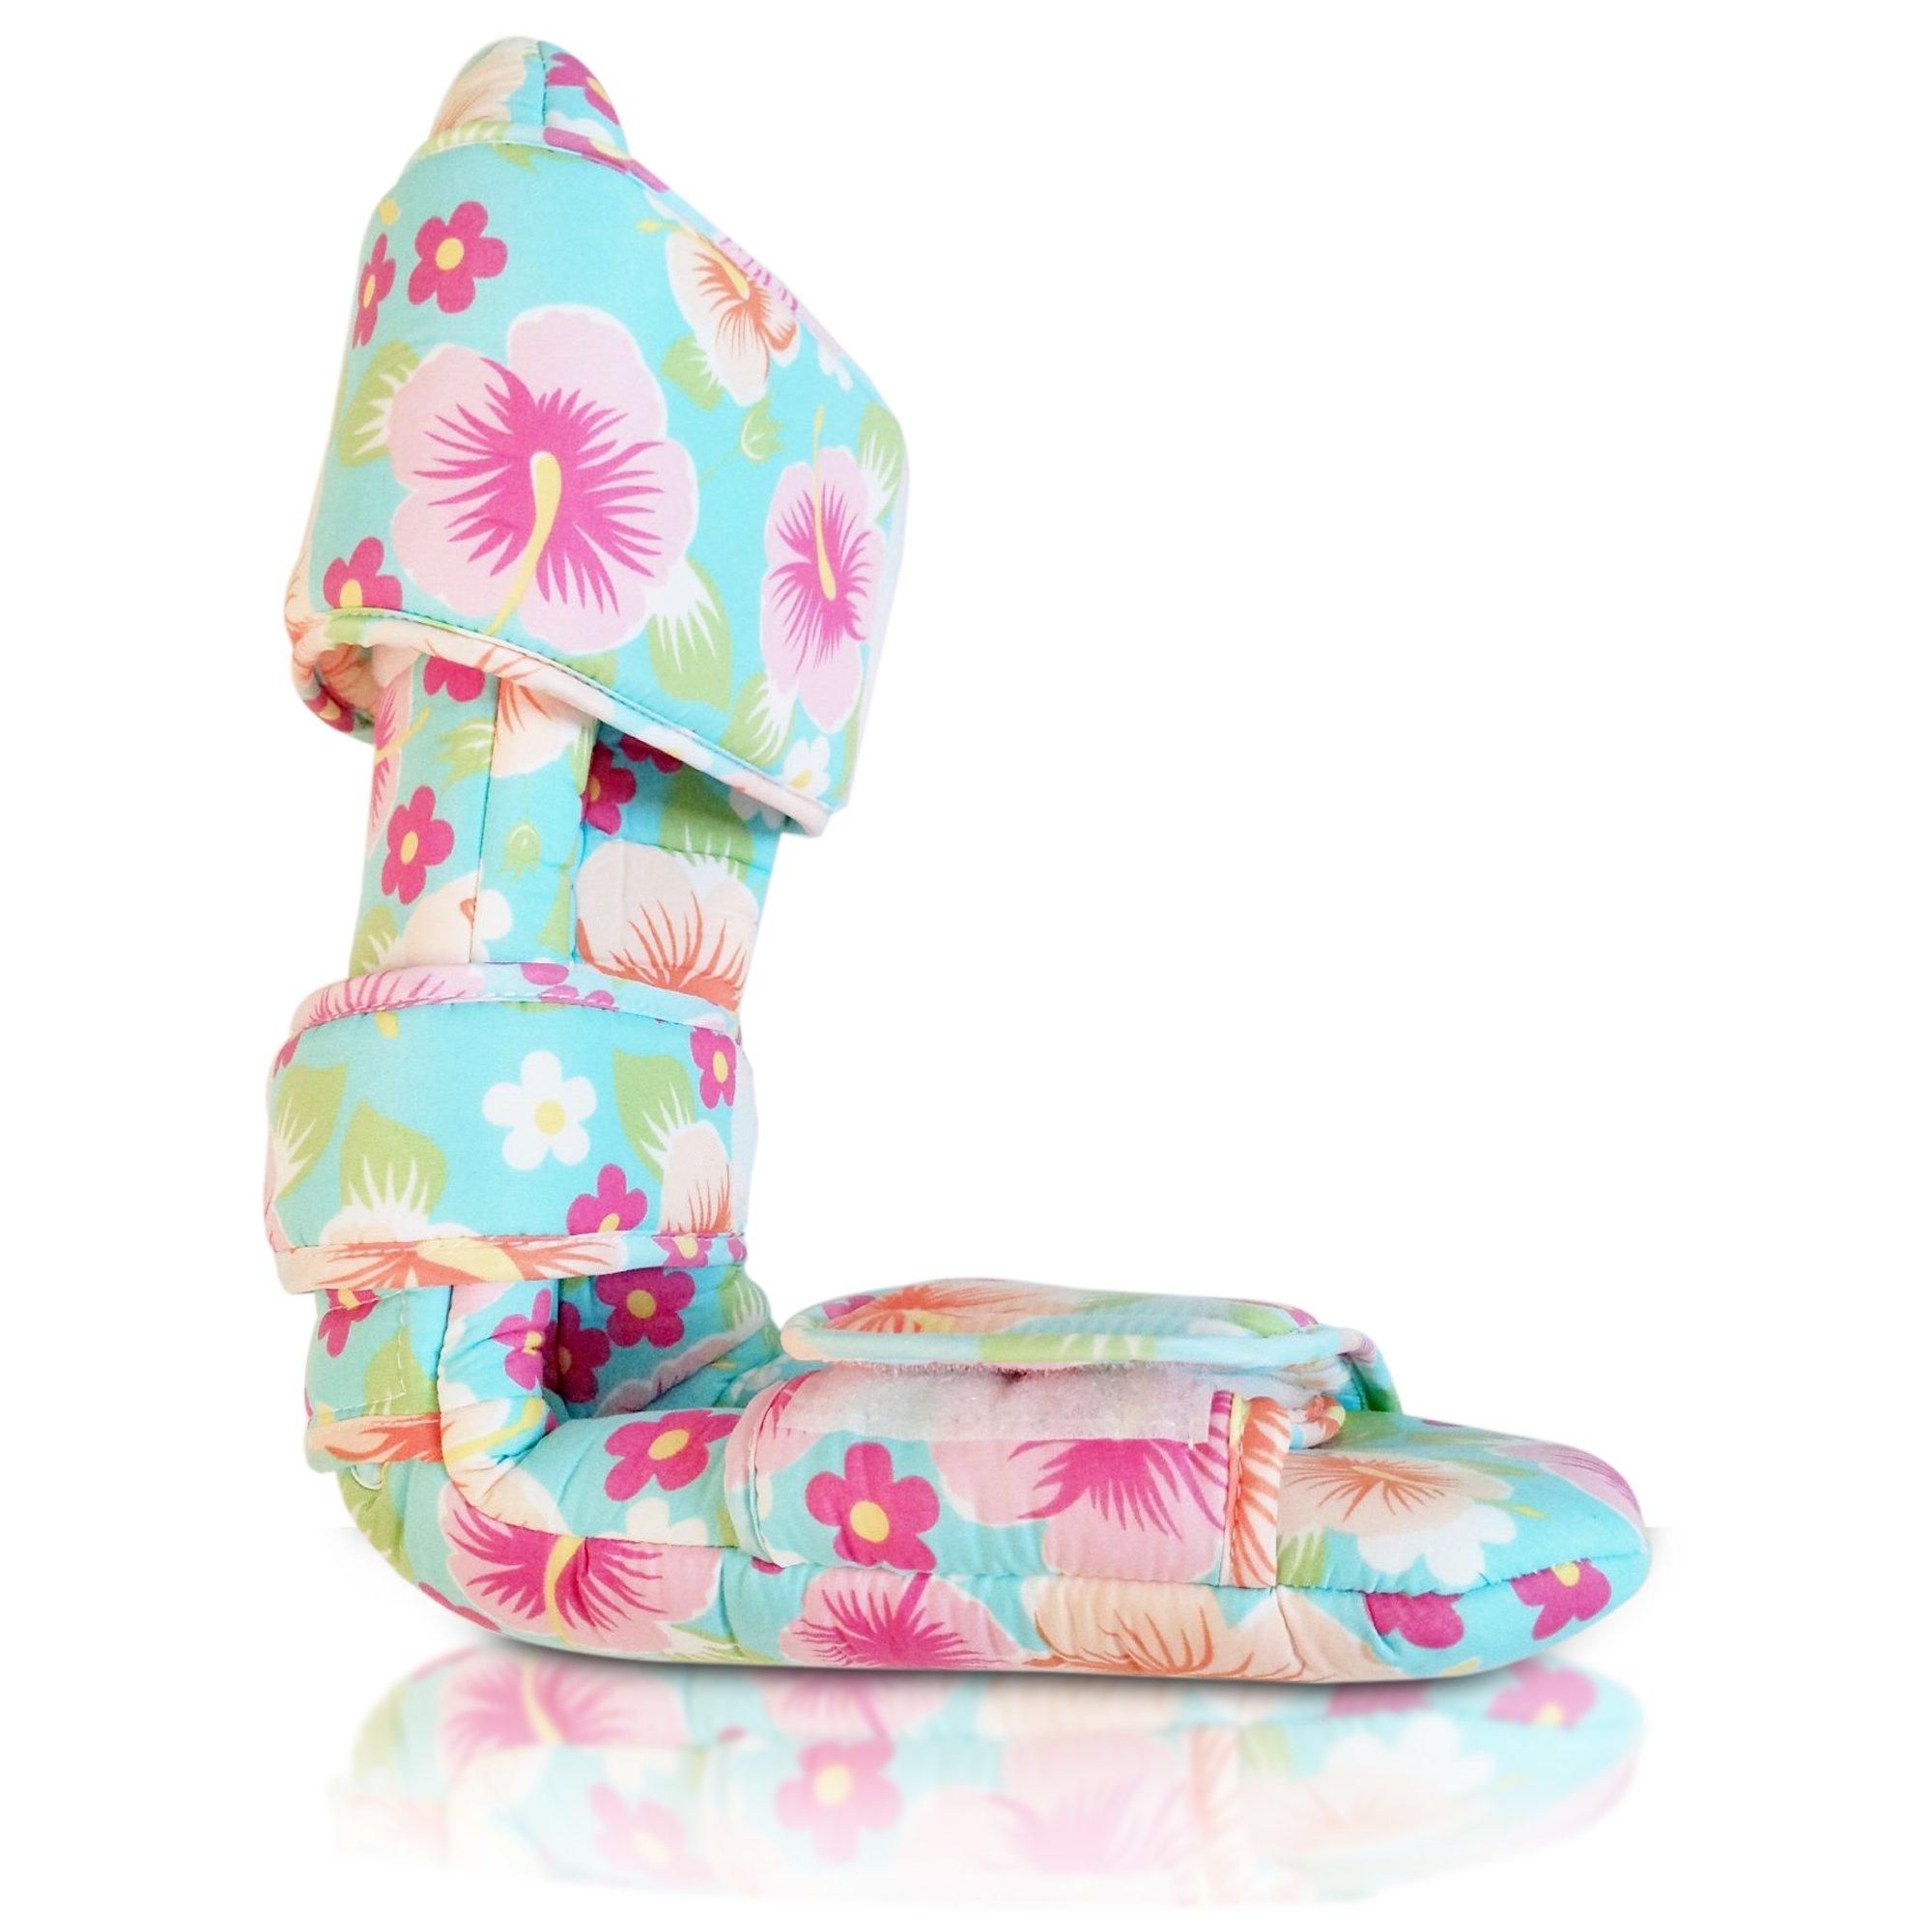 Plantar Fasciitis Soft Night Splint Stretch Heel Pain By Flexibrace® (SMALL)